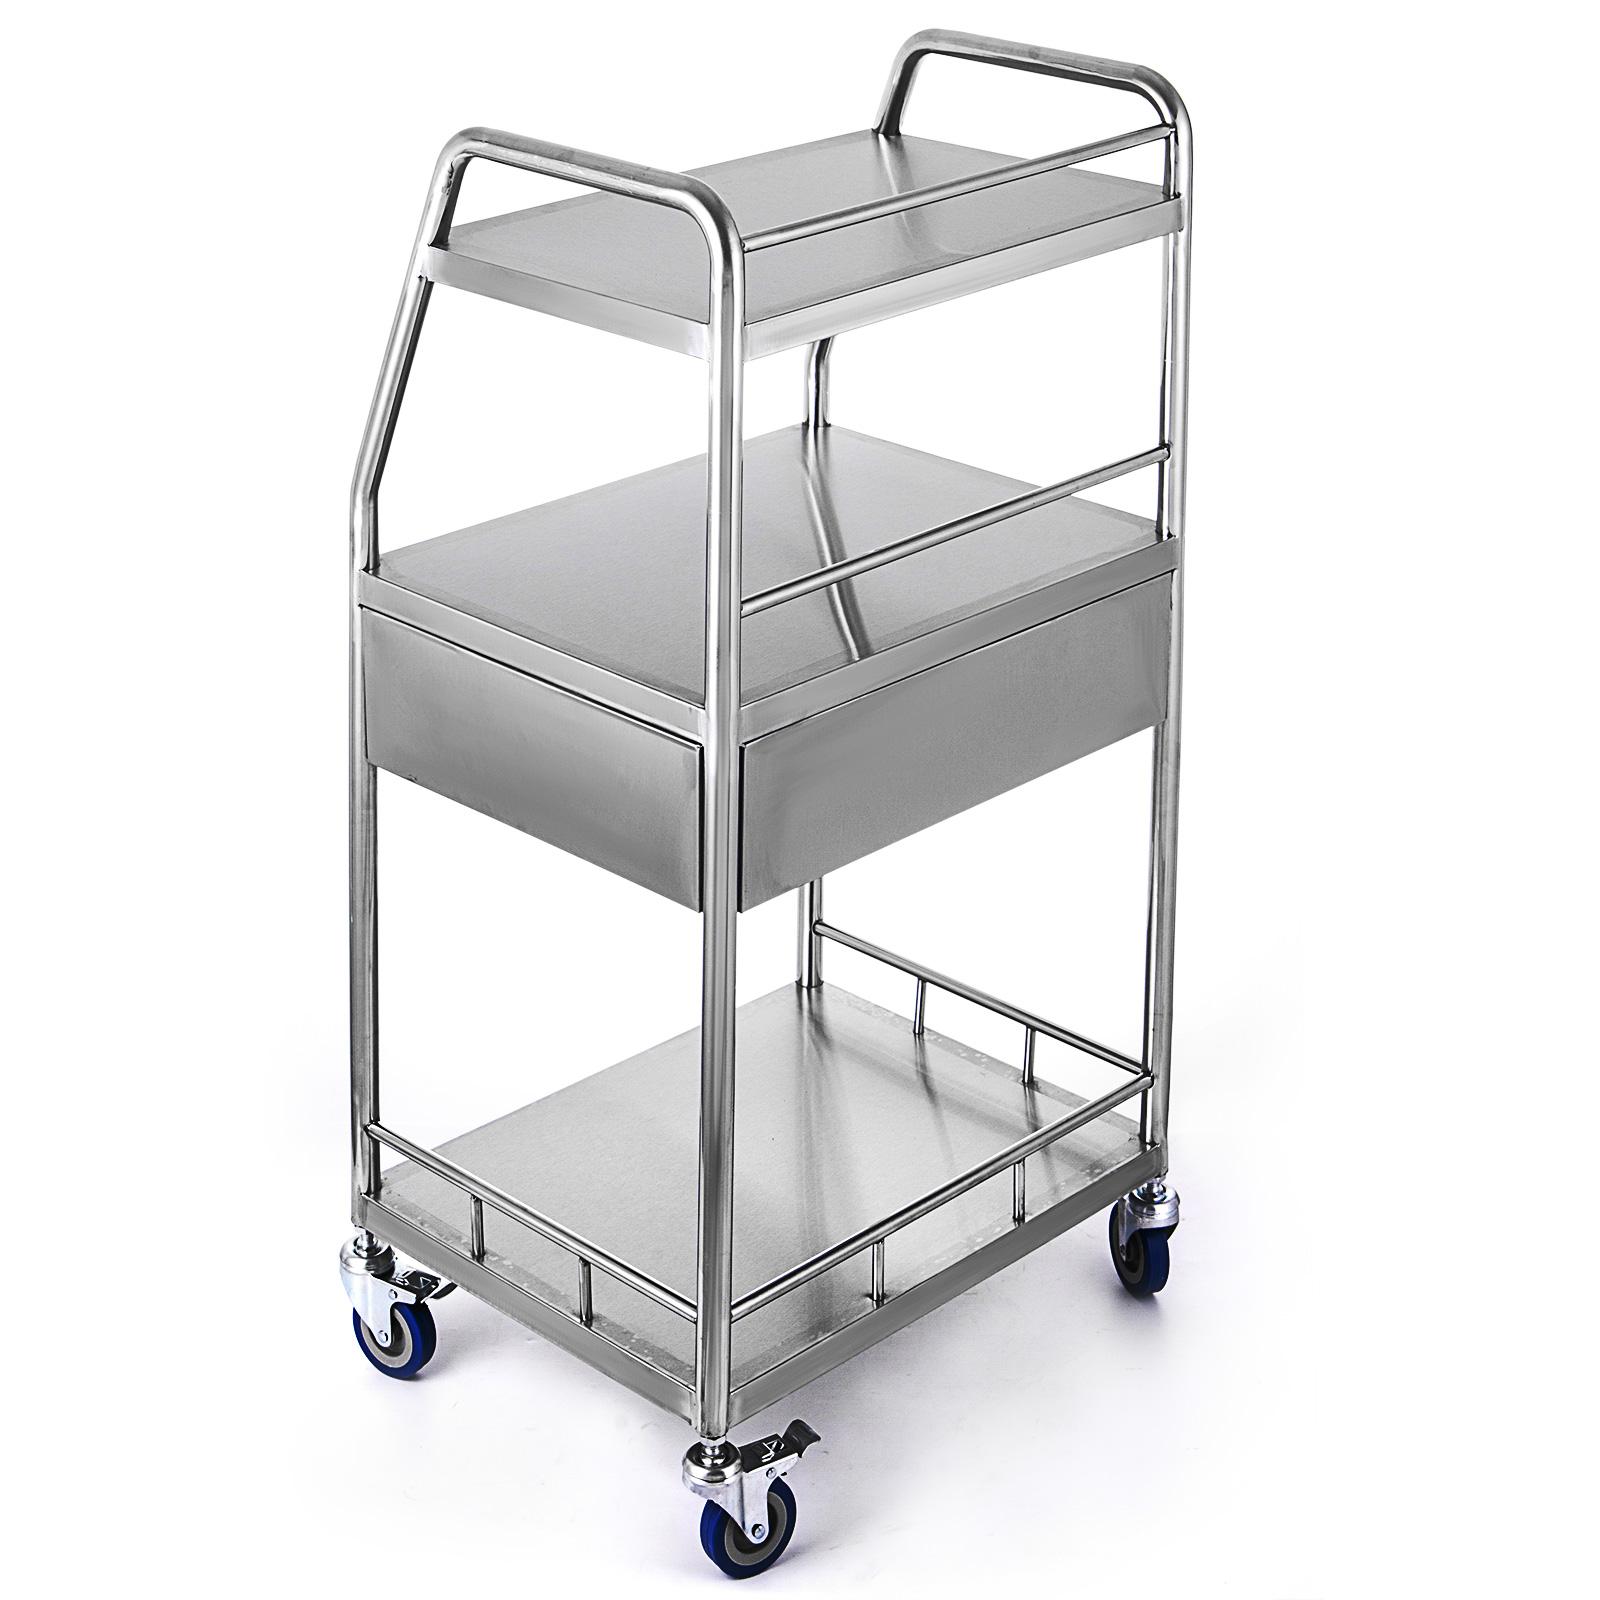 thumbnail 72 - Rolling Storage Cart Medical Salon Trolley Pedestal Rolling Cart Stainless Steel